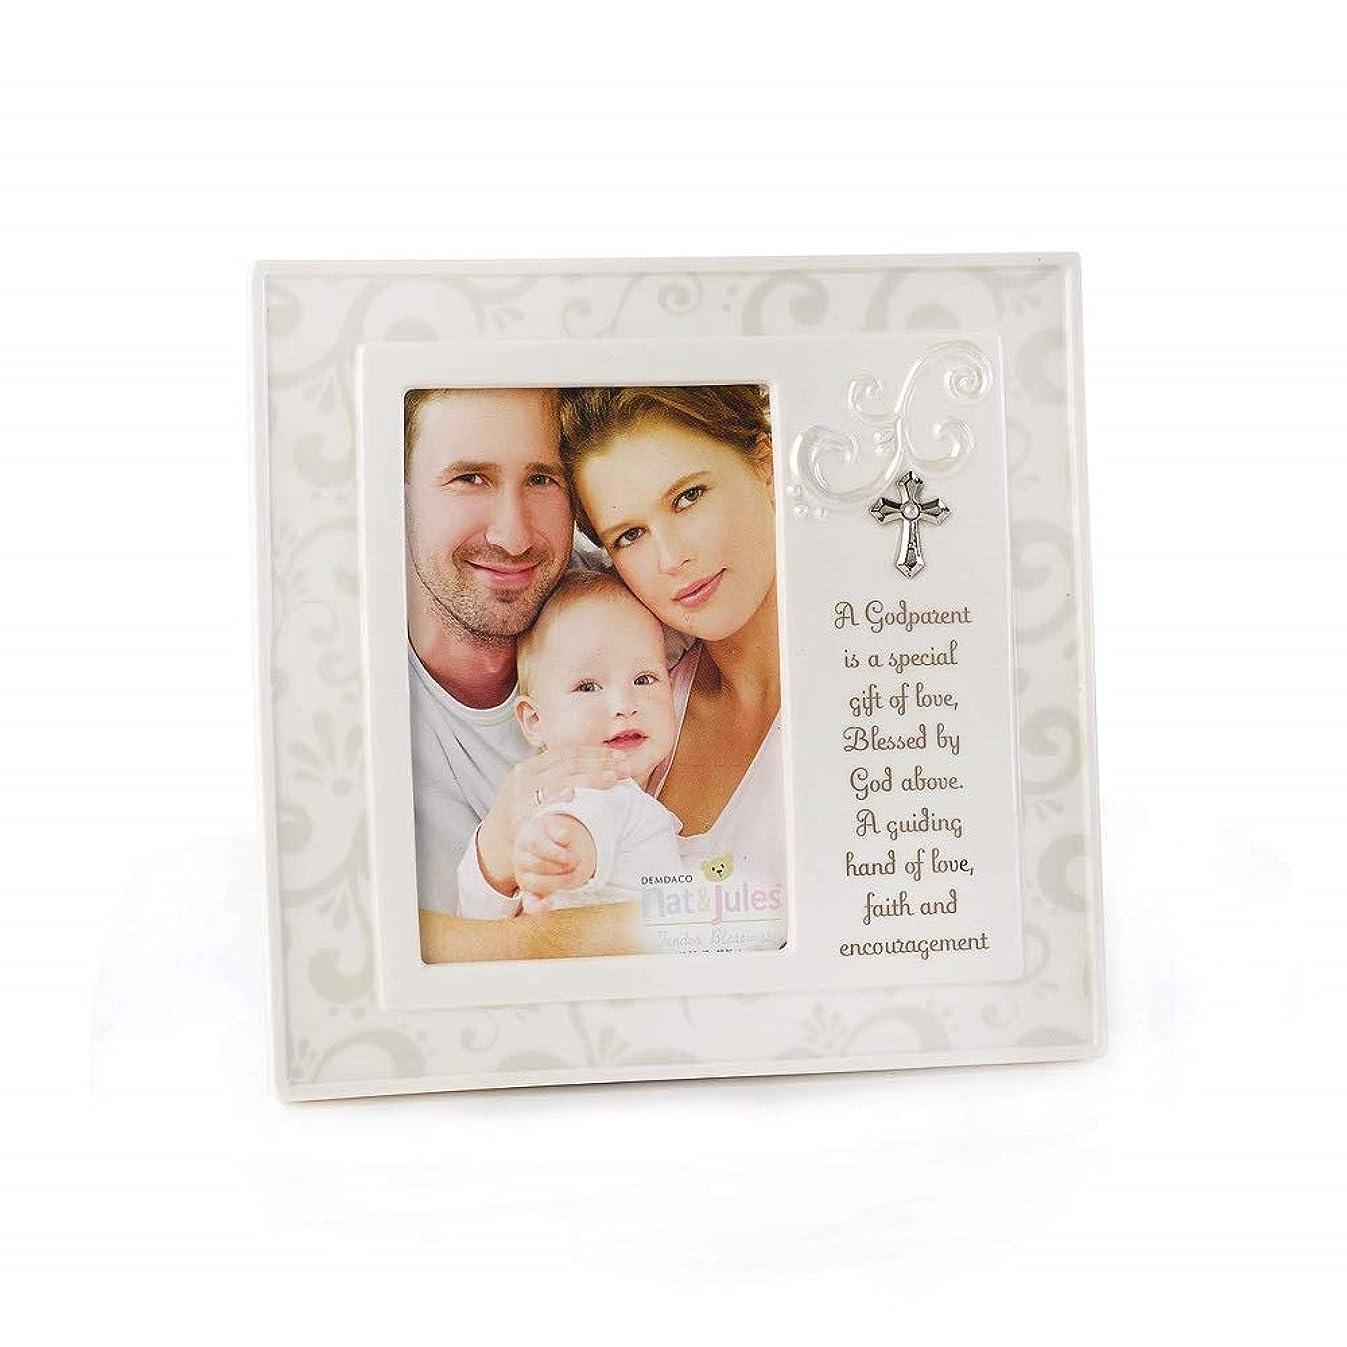 DEMDACO Godparent 8.5 x 8.5 Porcelain Picture Frame